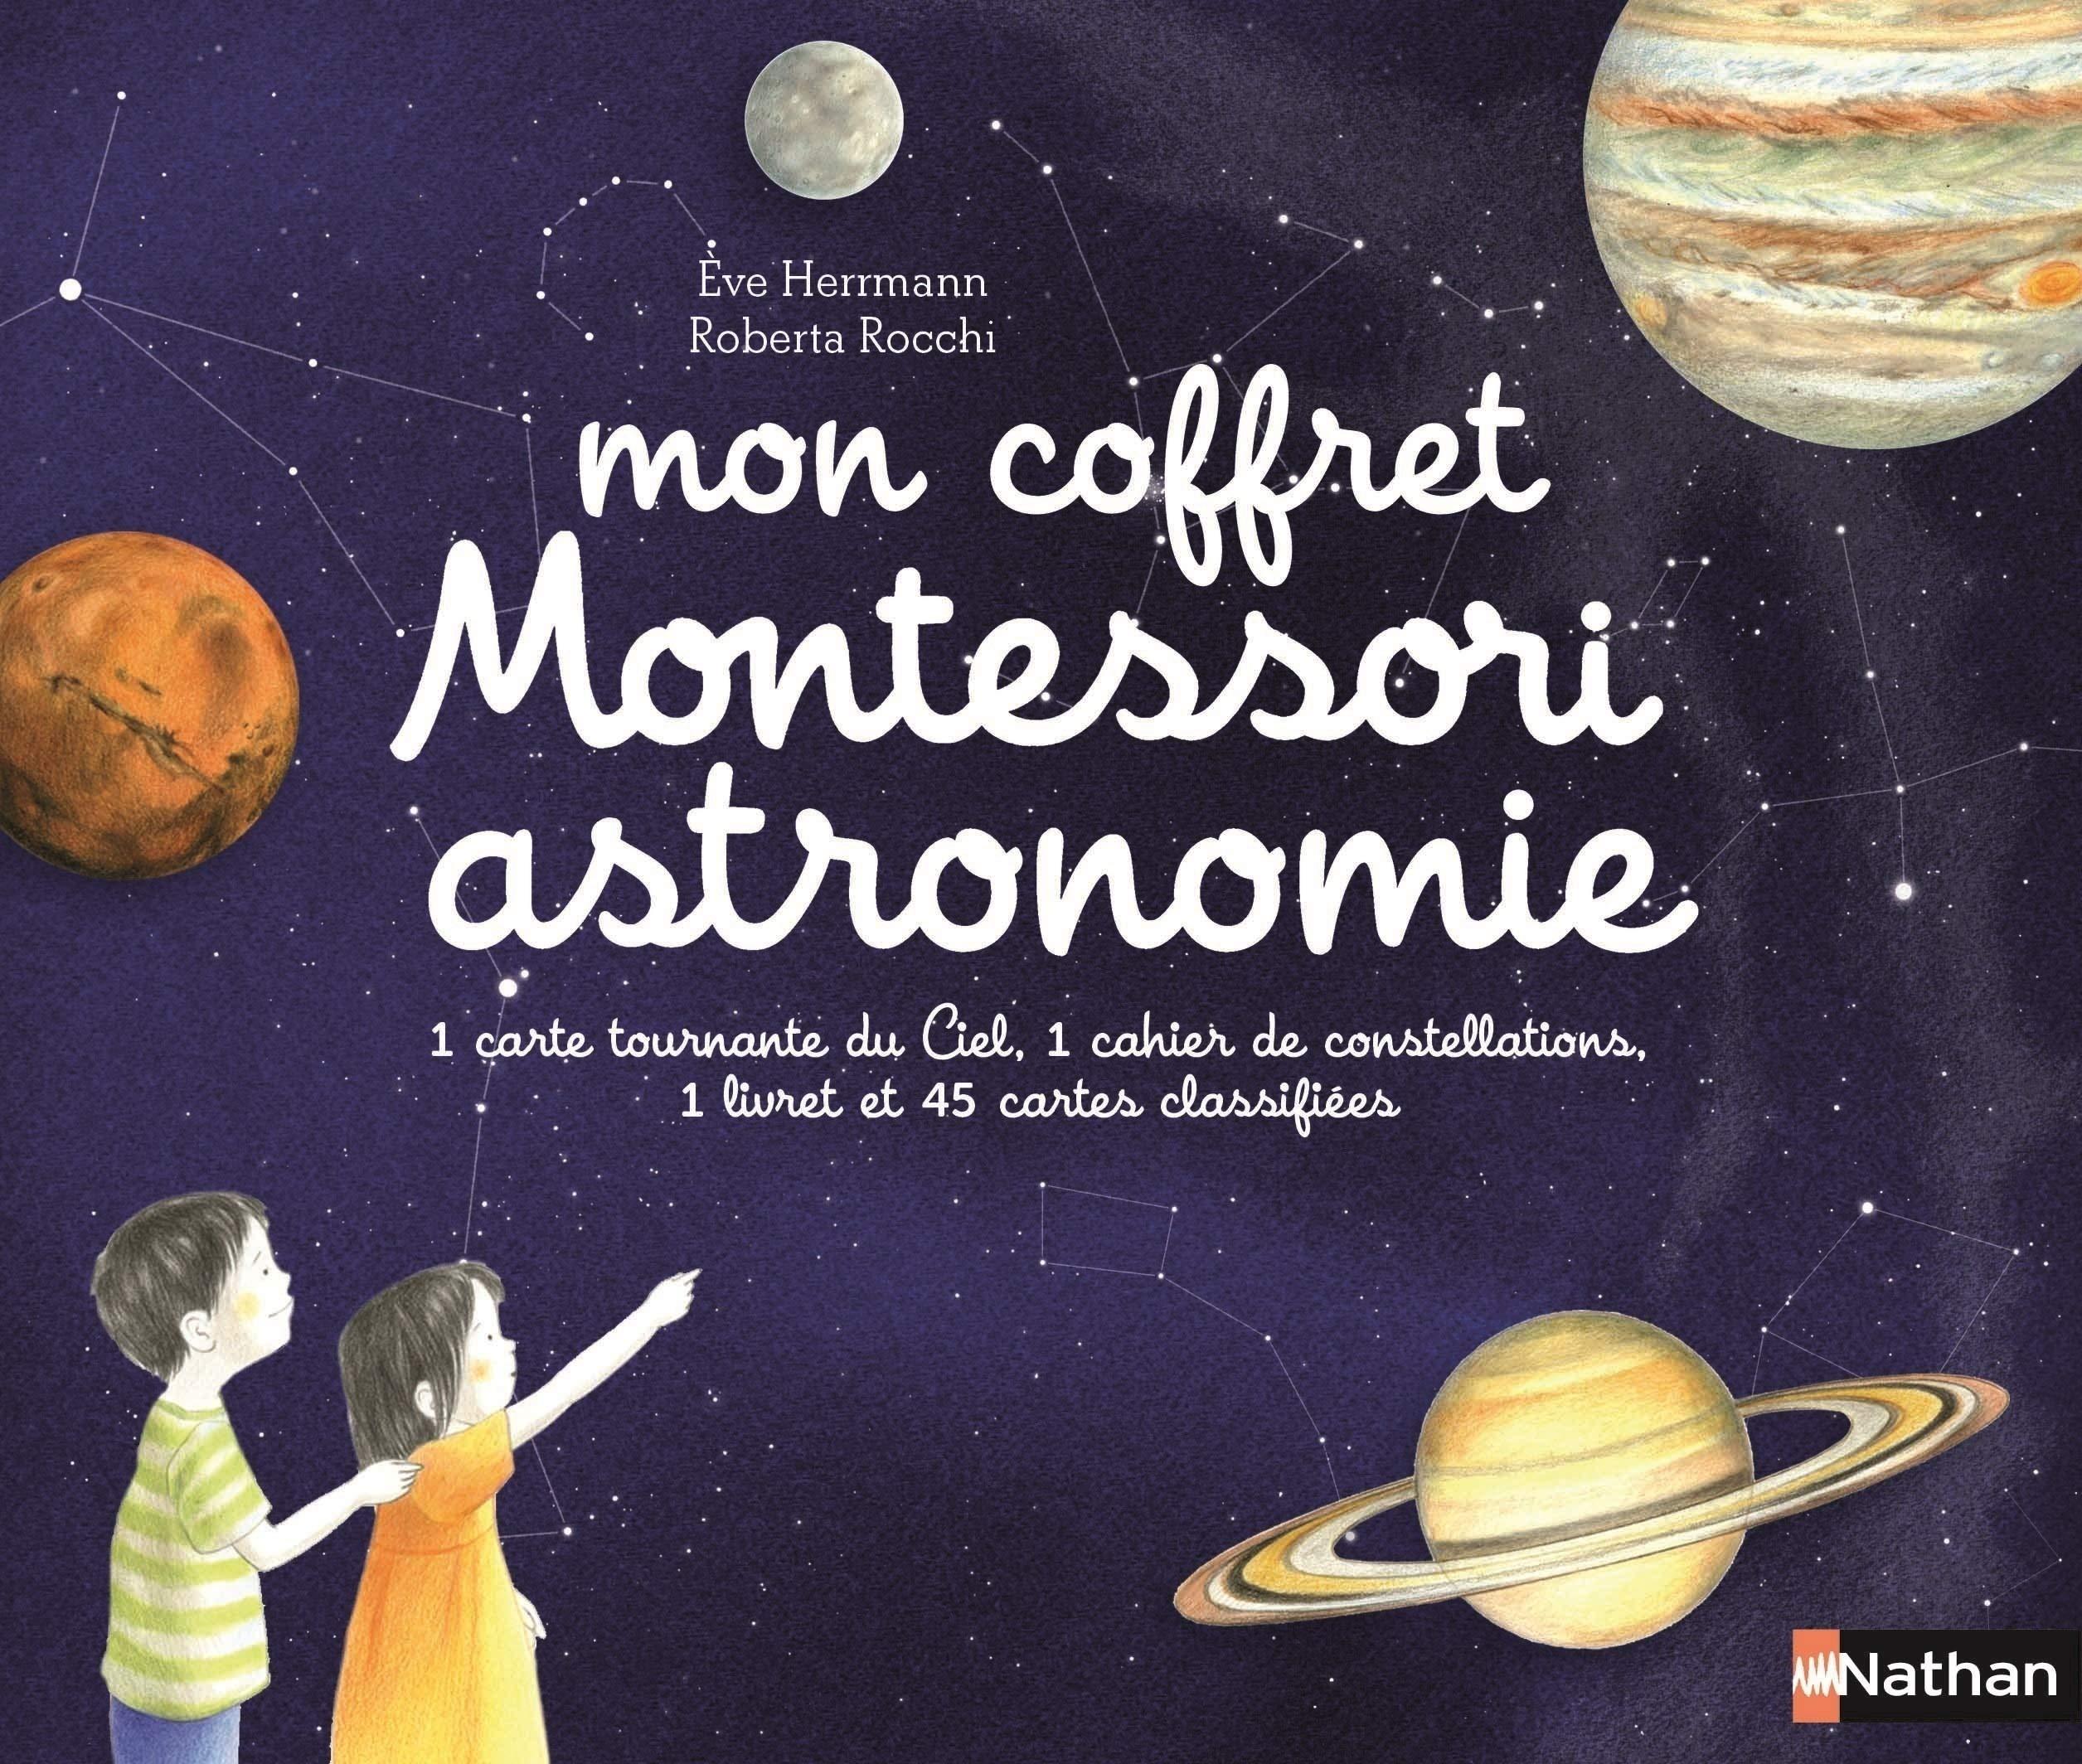 Mon coffret Montessori pour l'astronomie